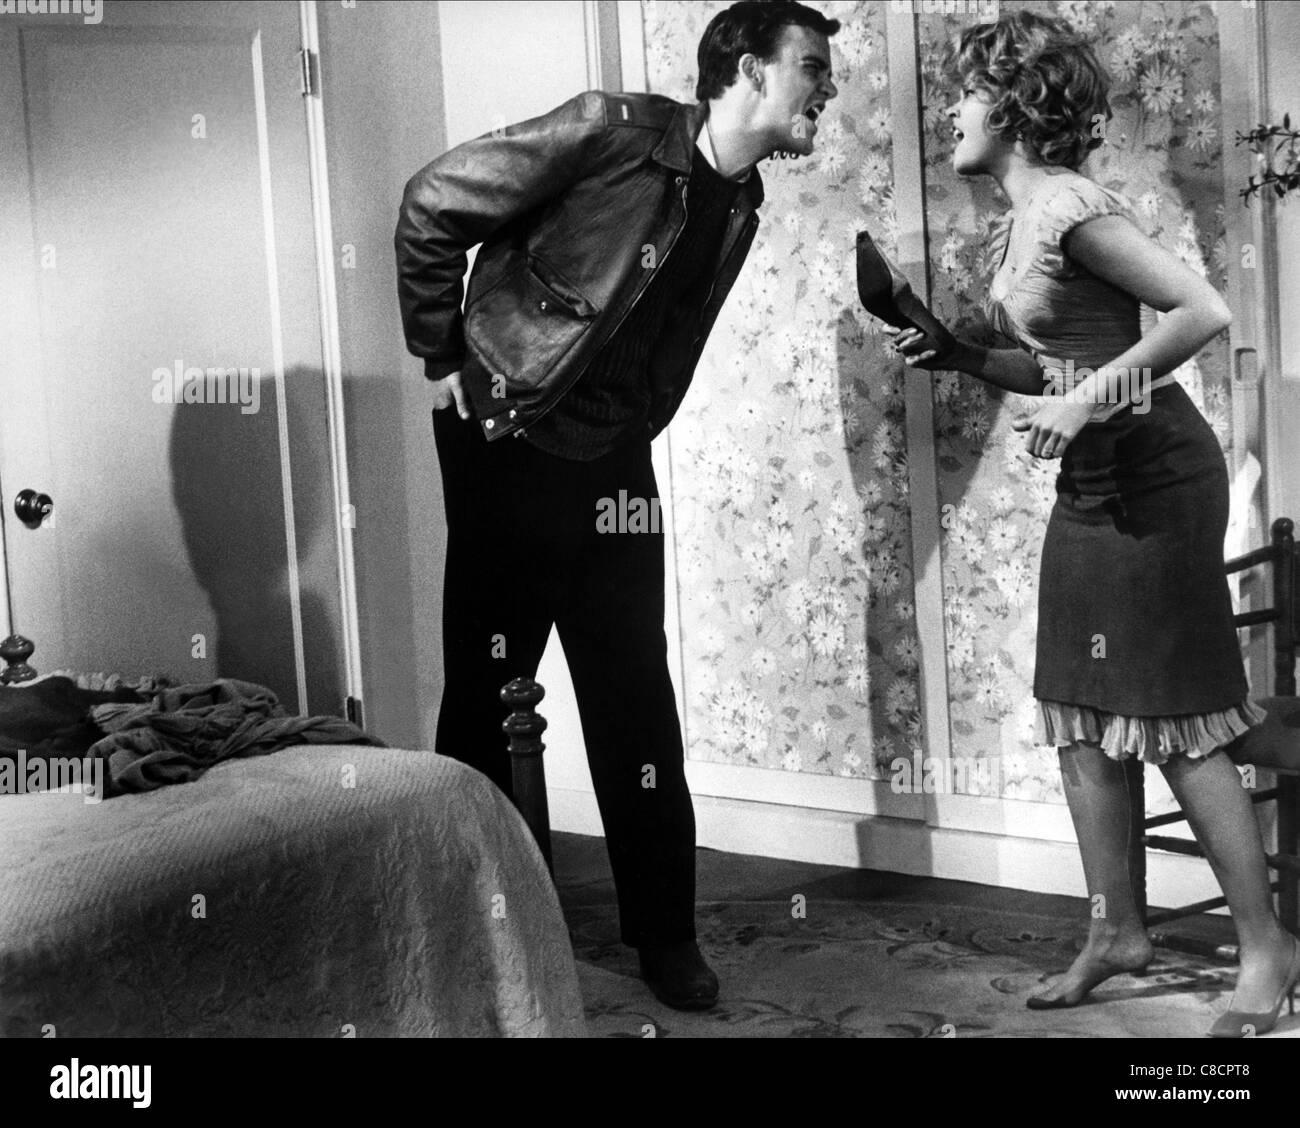 JIM HUTTON & JANE FONDA PERIOD OF ADJUSTMENT (1962) - Stock Image